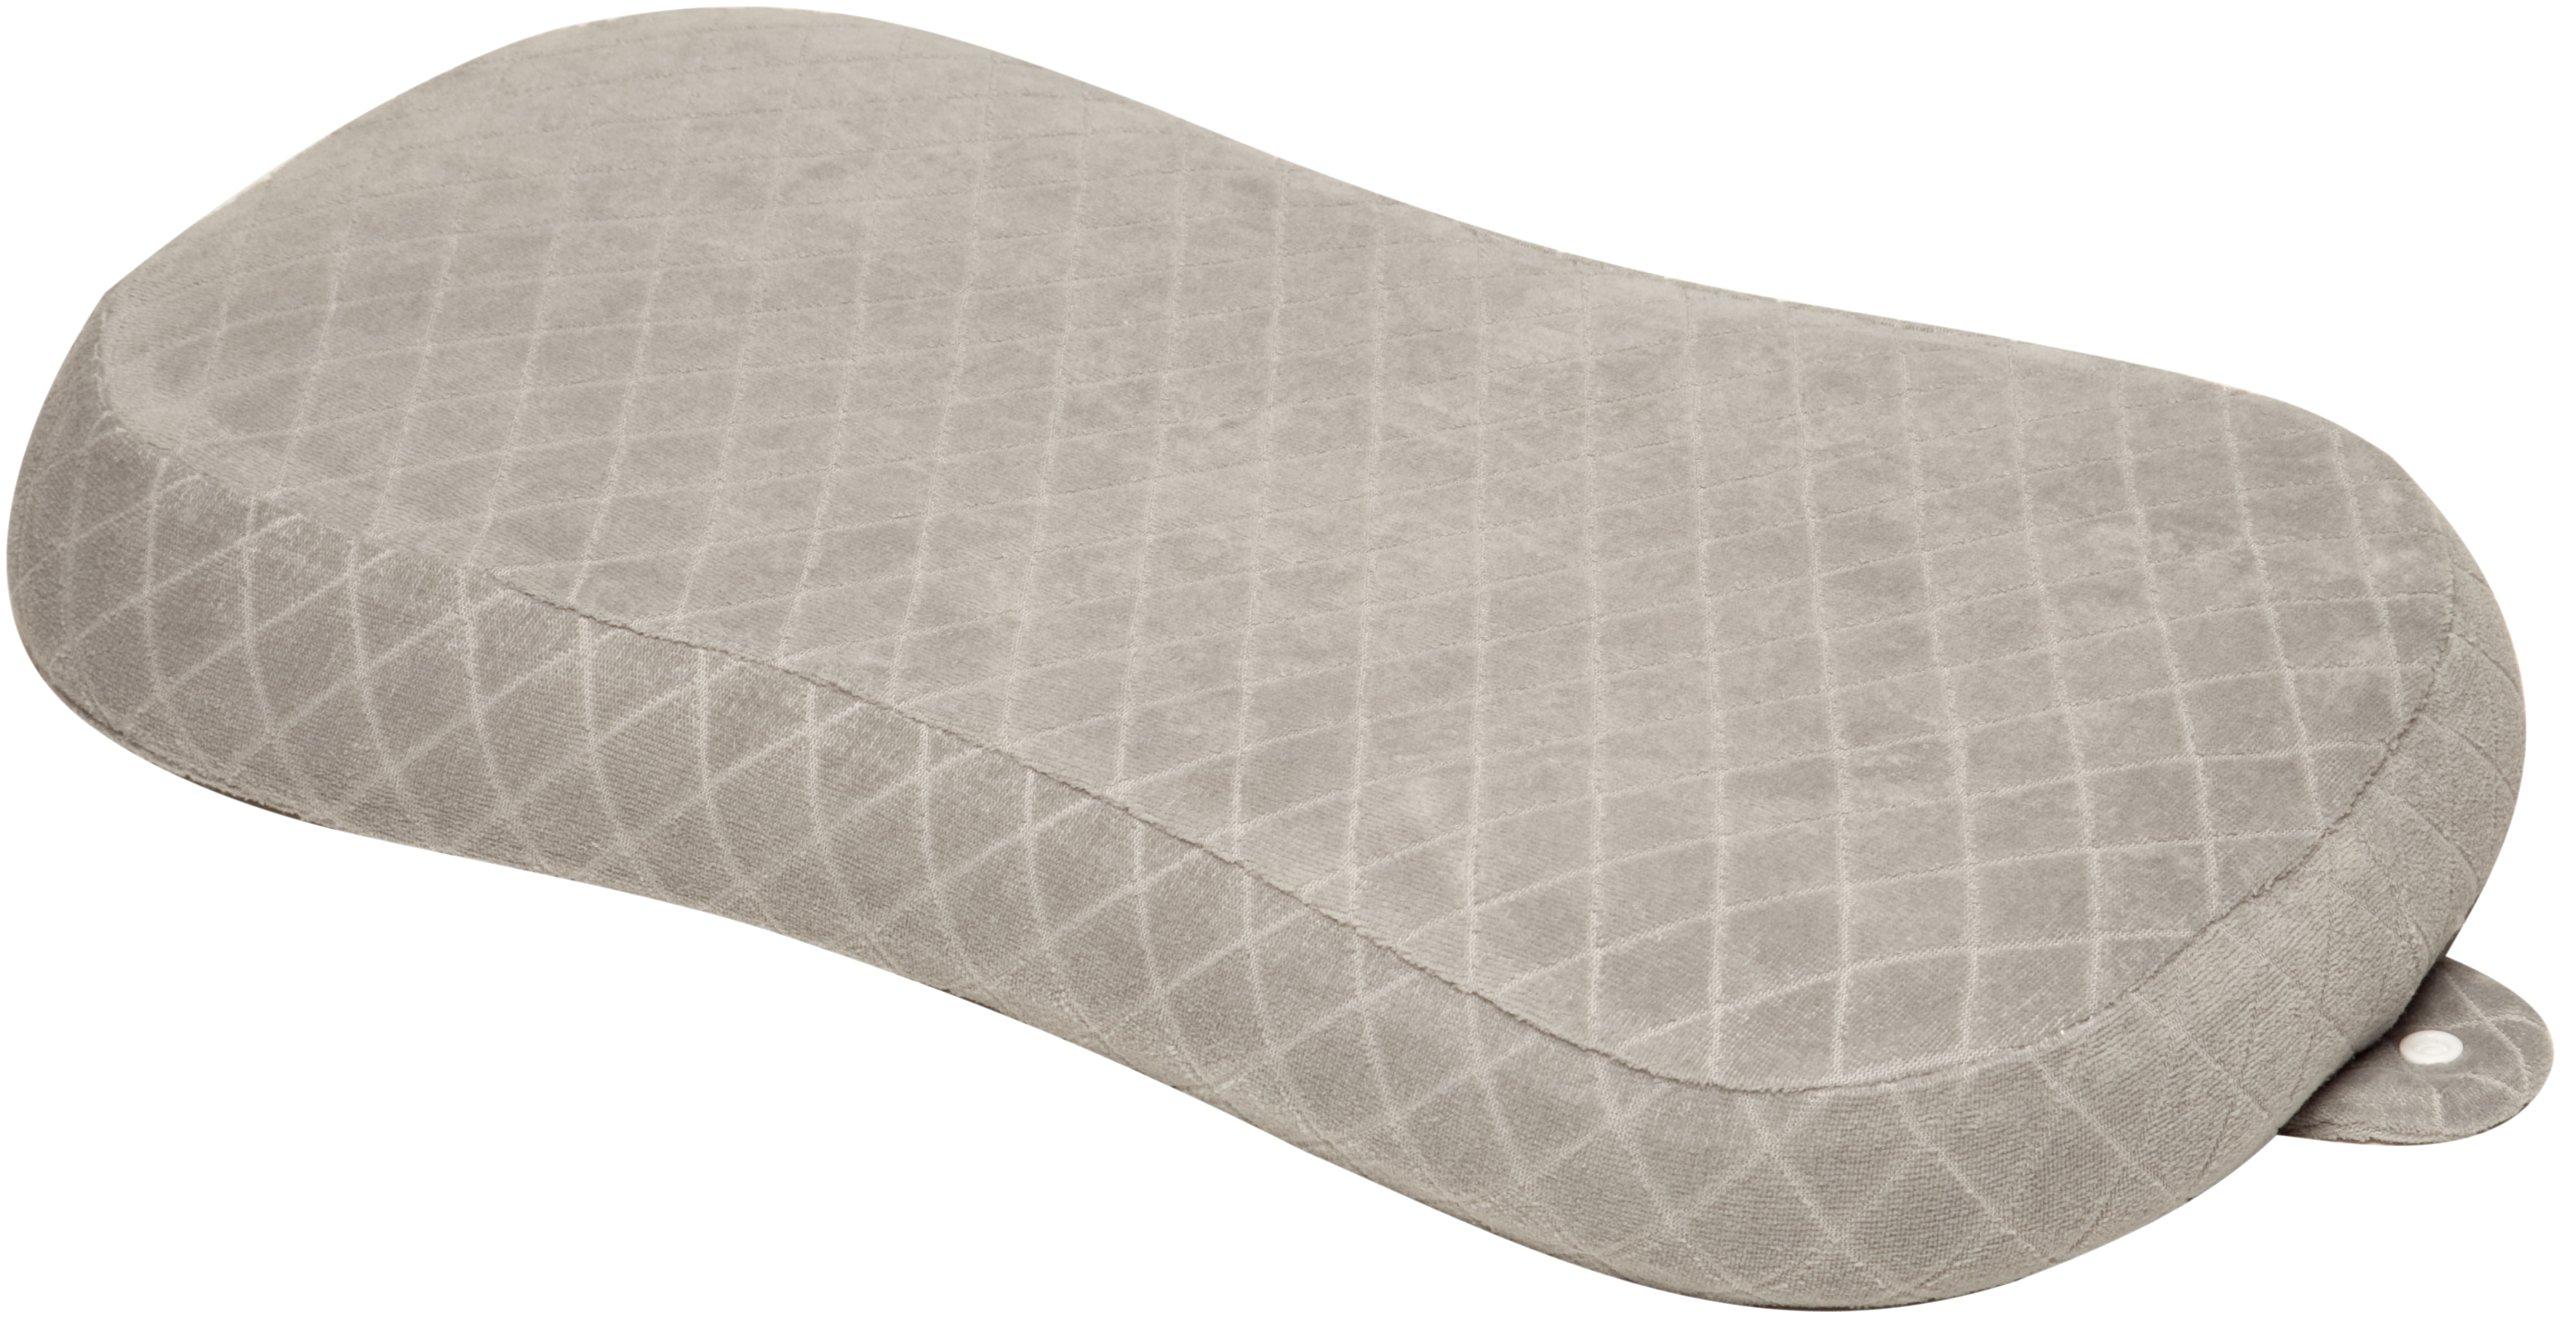 Rio Home Fashions Universal Memory Foam Pillow